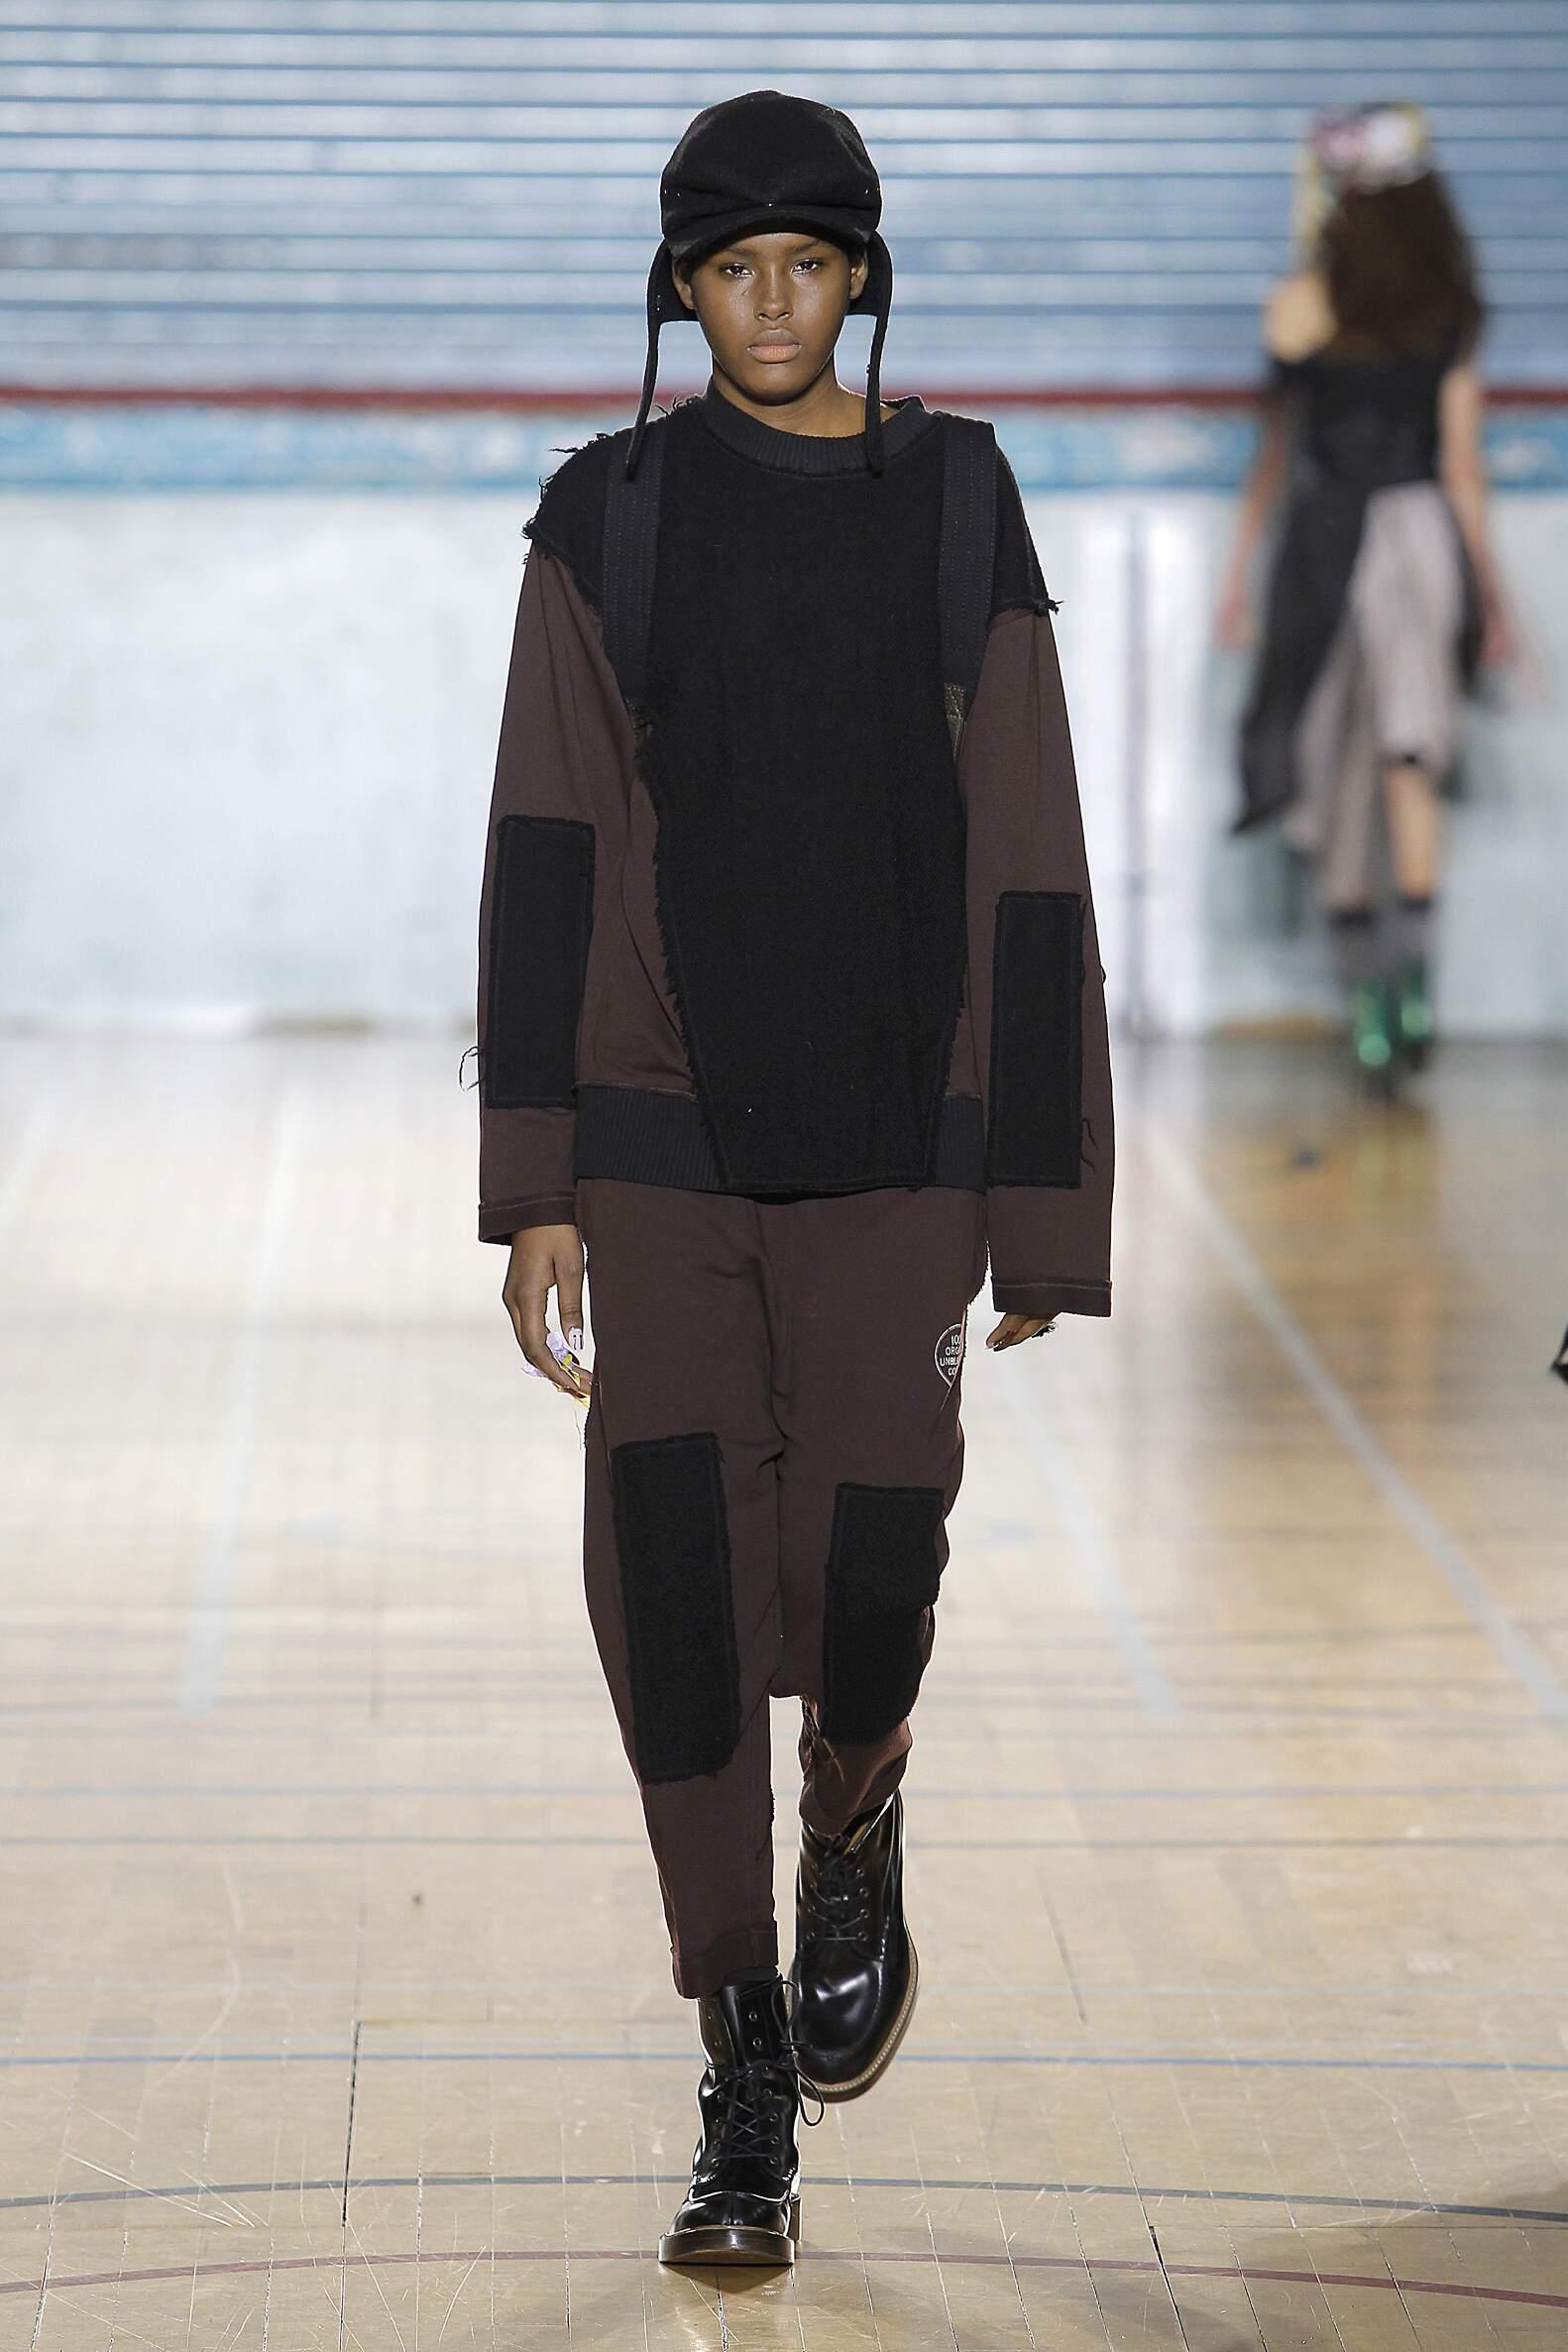 2017 Vivienne Westwood Catwalk London Fashion Week